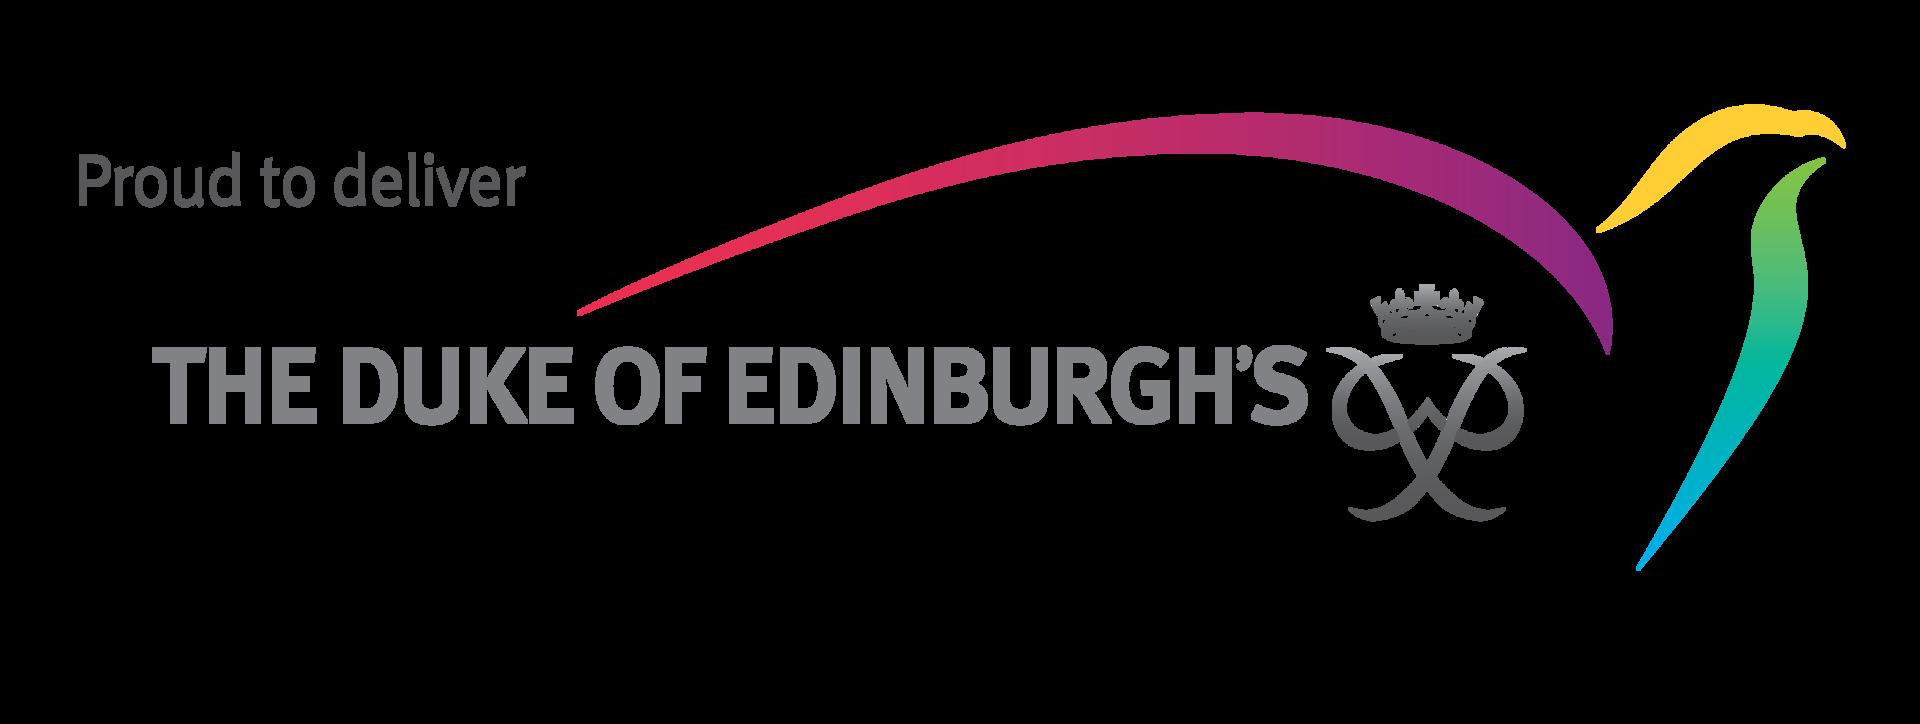 Logo Premio Internacional Duque de Edimburgo